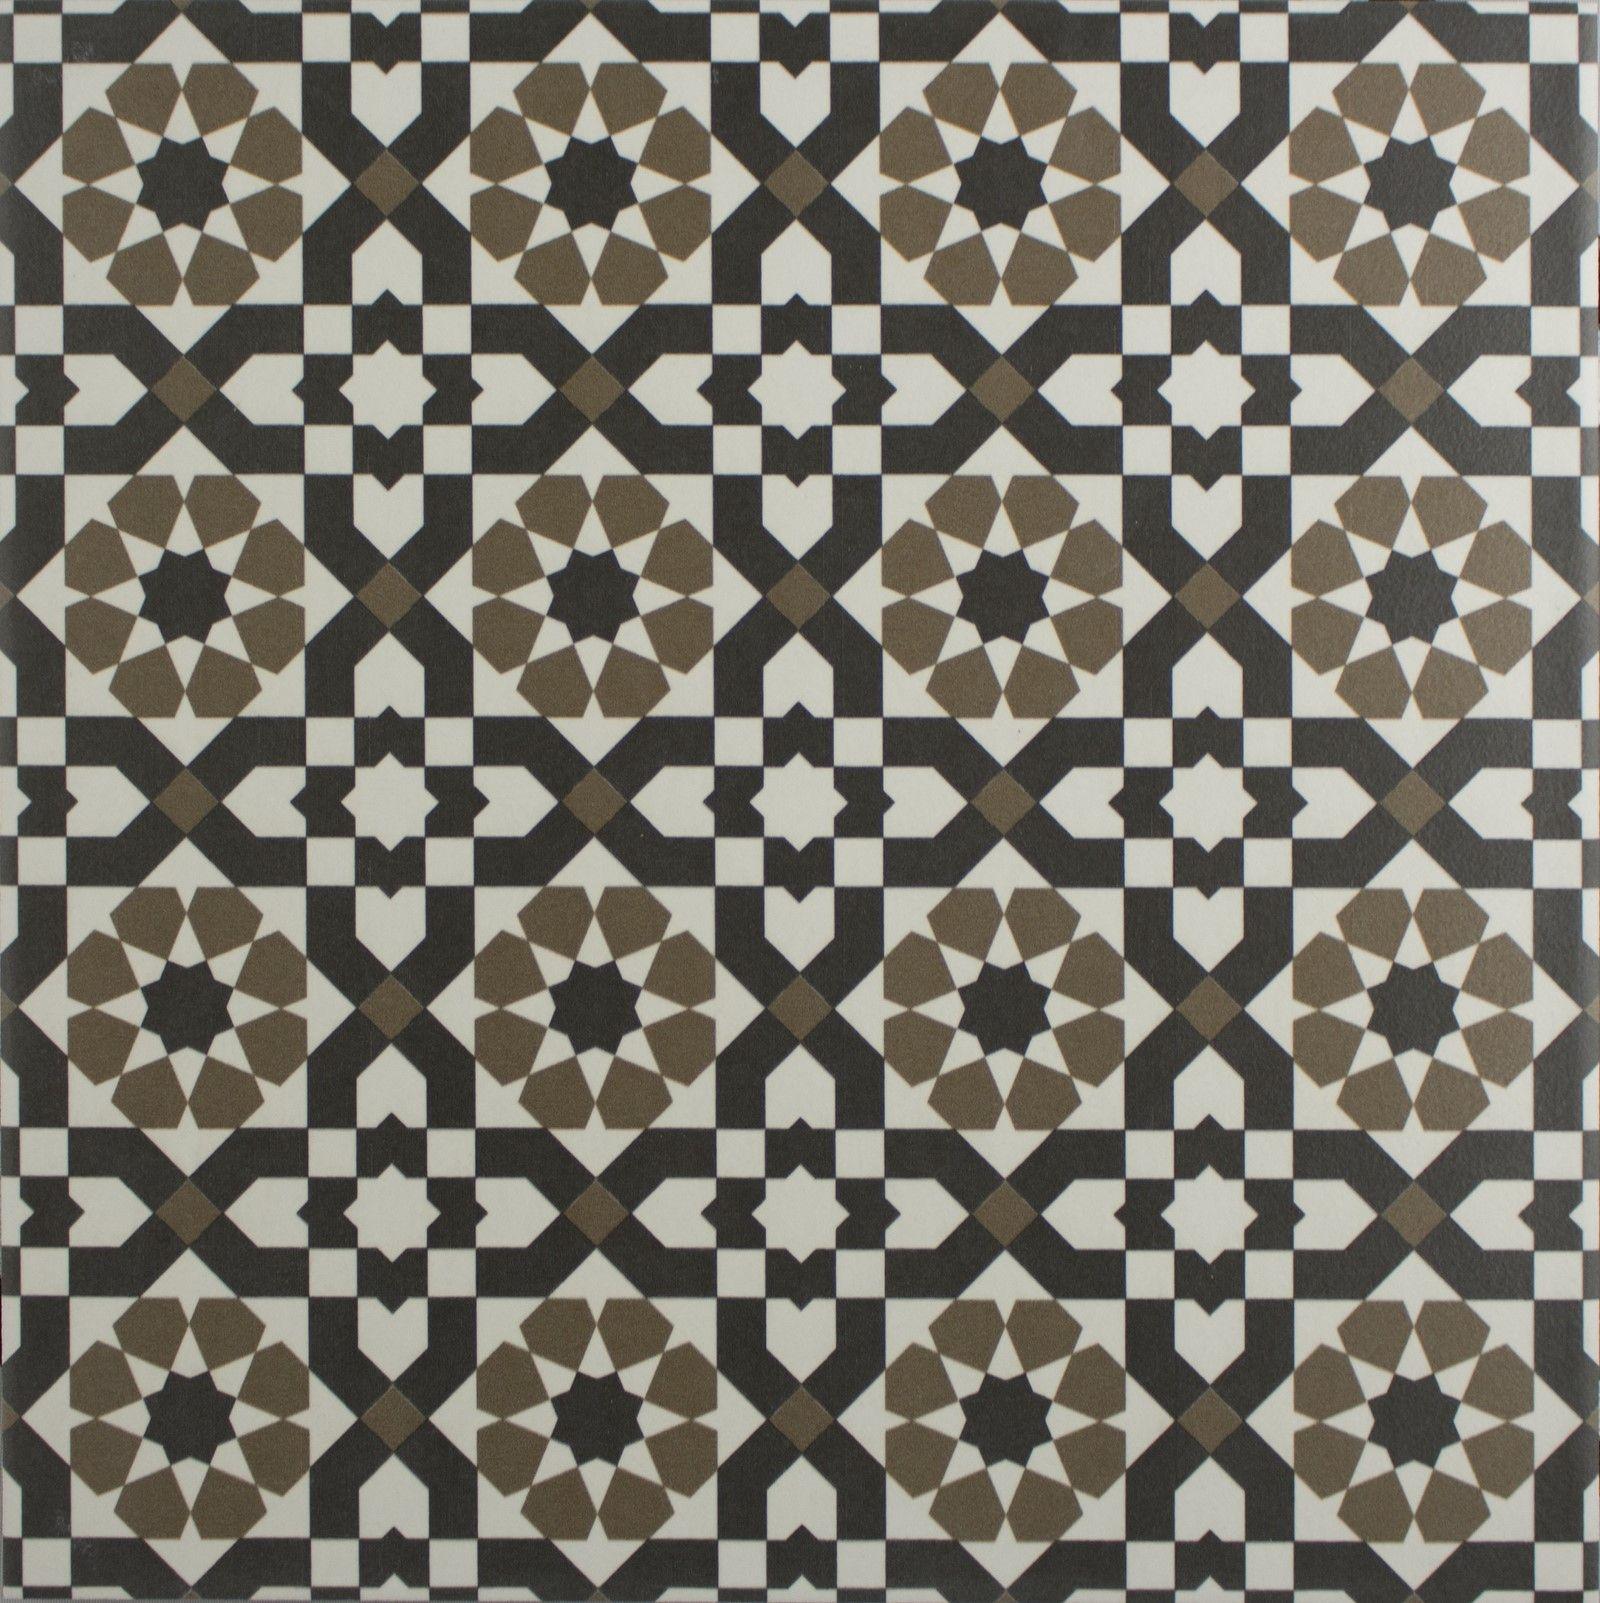 Decorative Tile Floors Marrakech Catarina Silver 16 Pattern Floor Tile  Marrakech